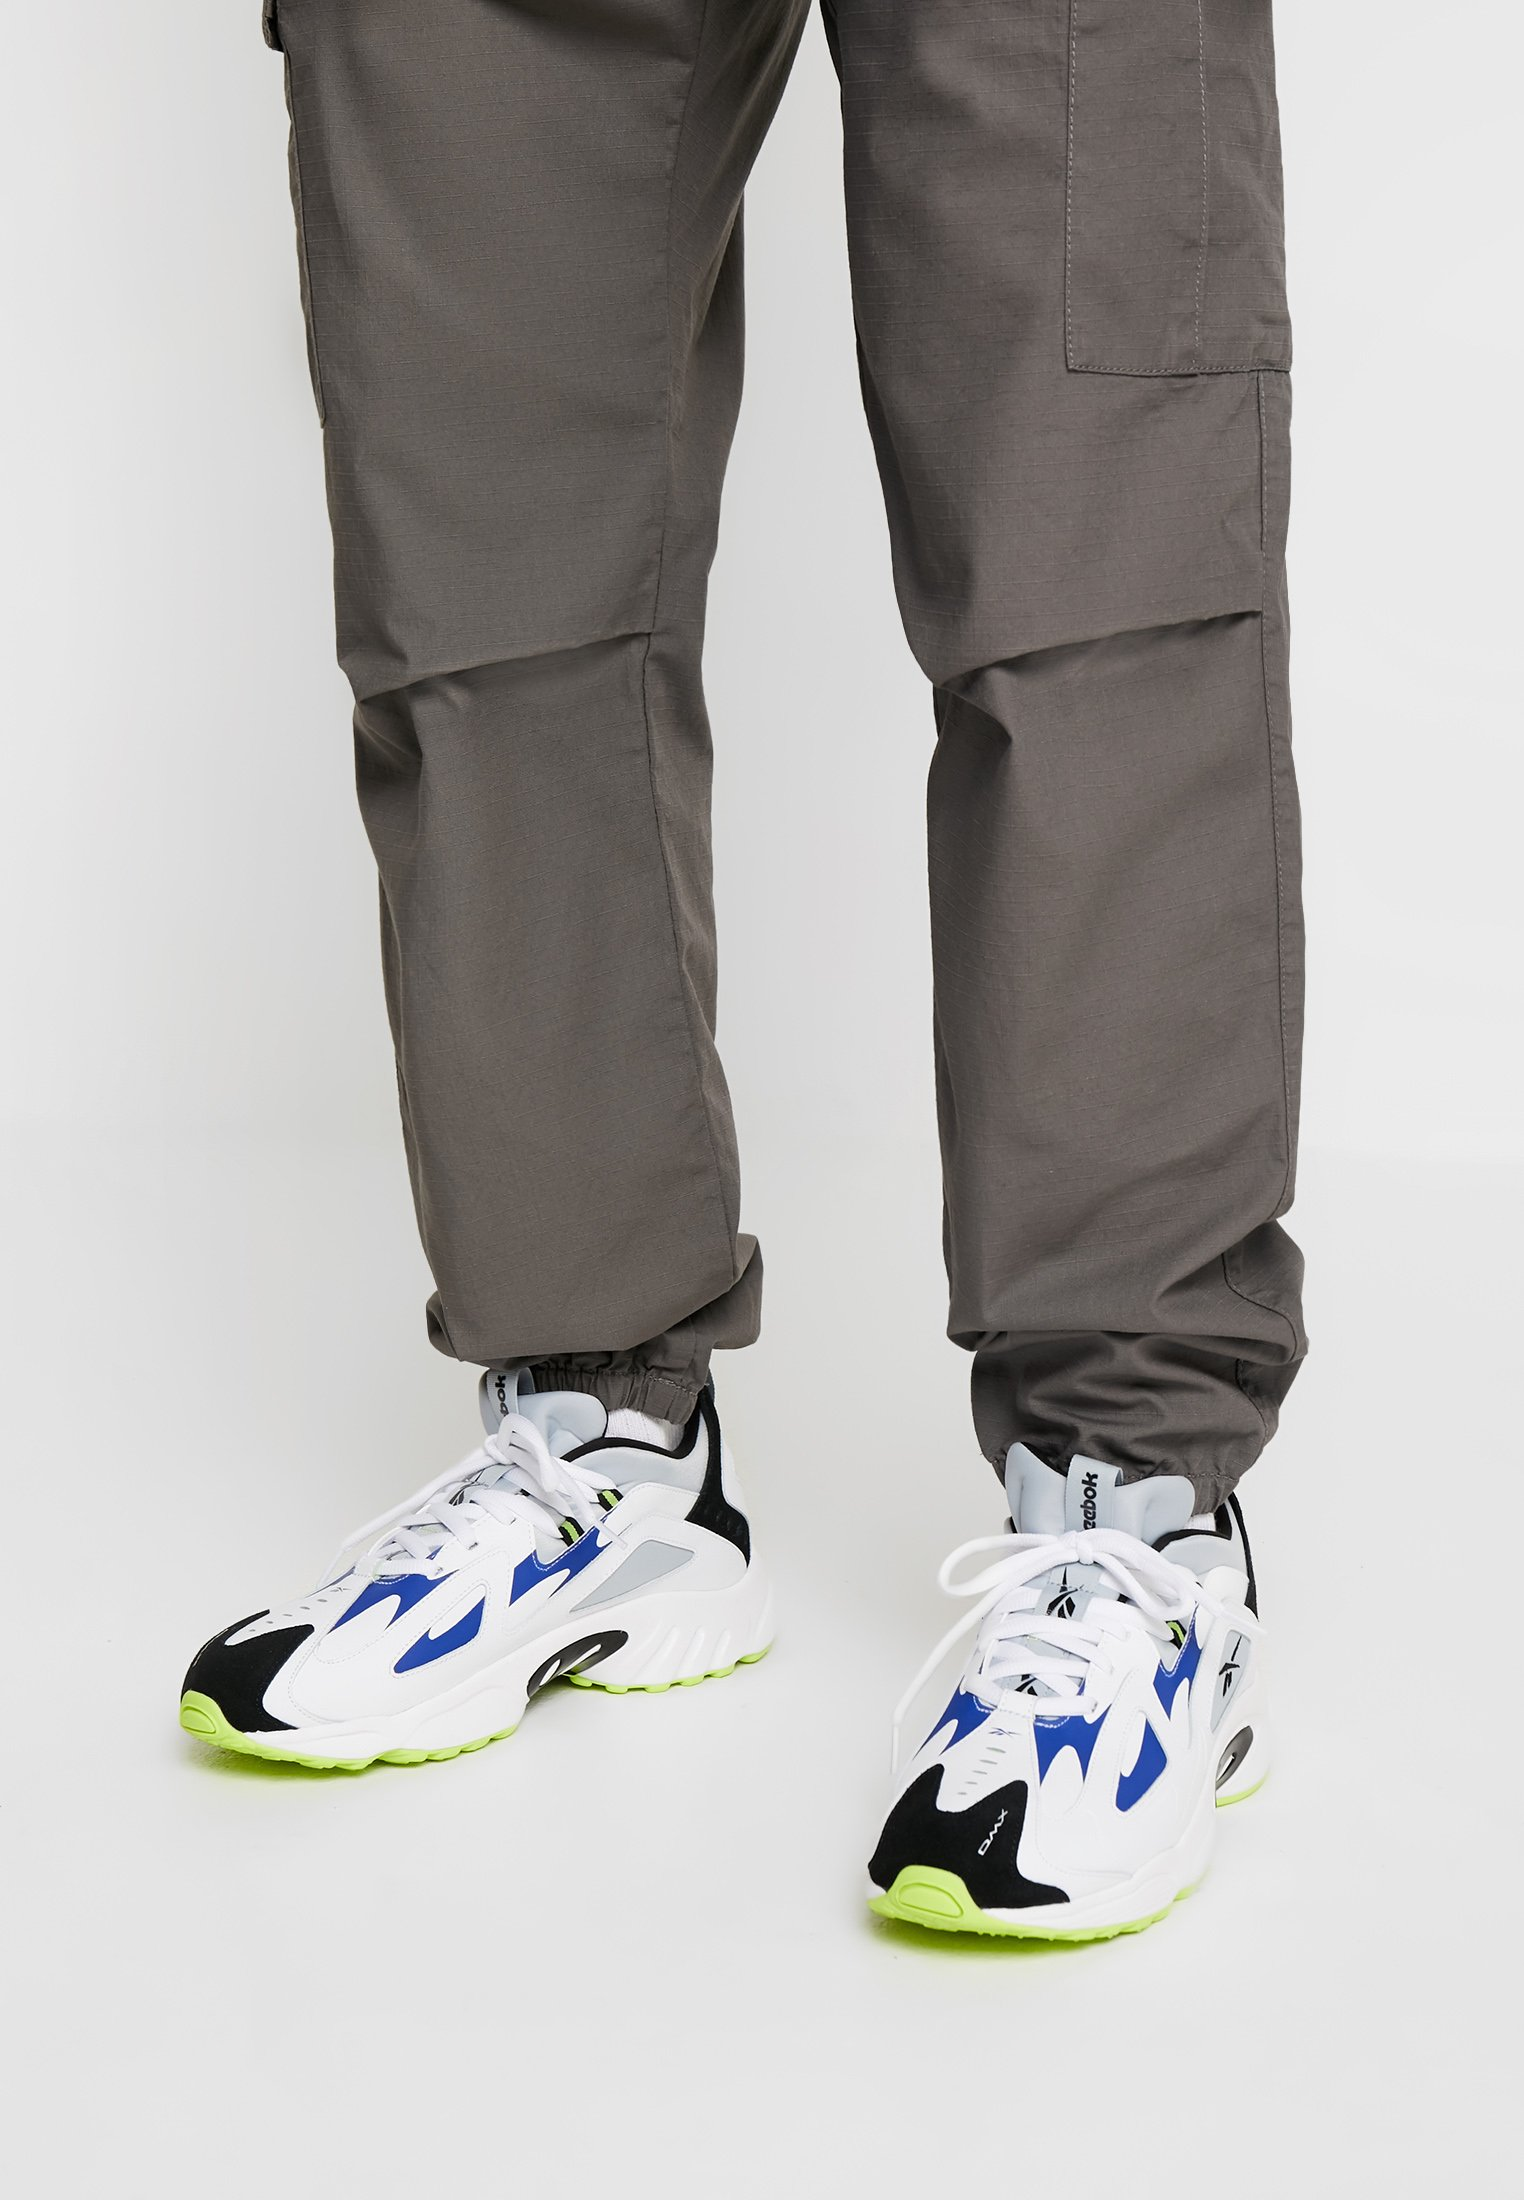 Reebok Classic Dmx Series 1200 - Sneakers White/cloud Grey/blue